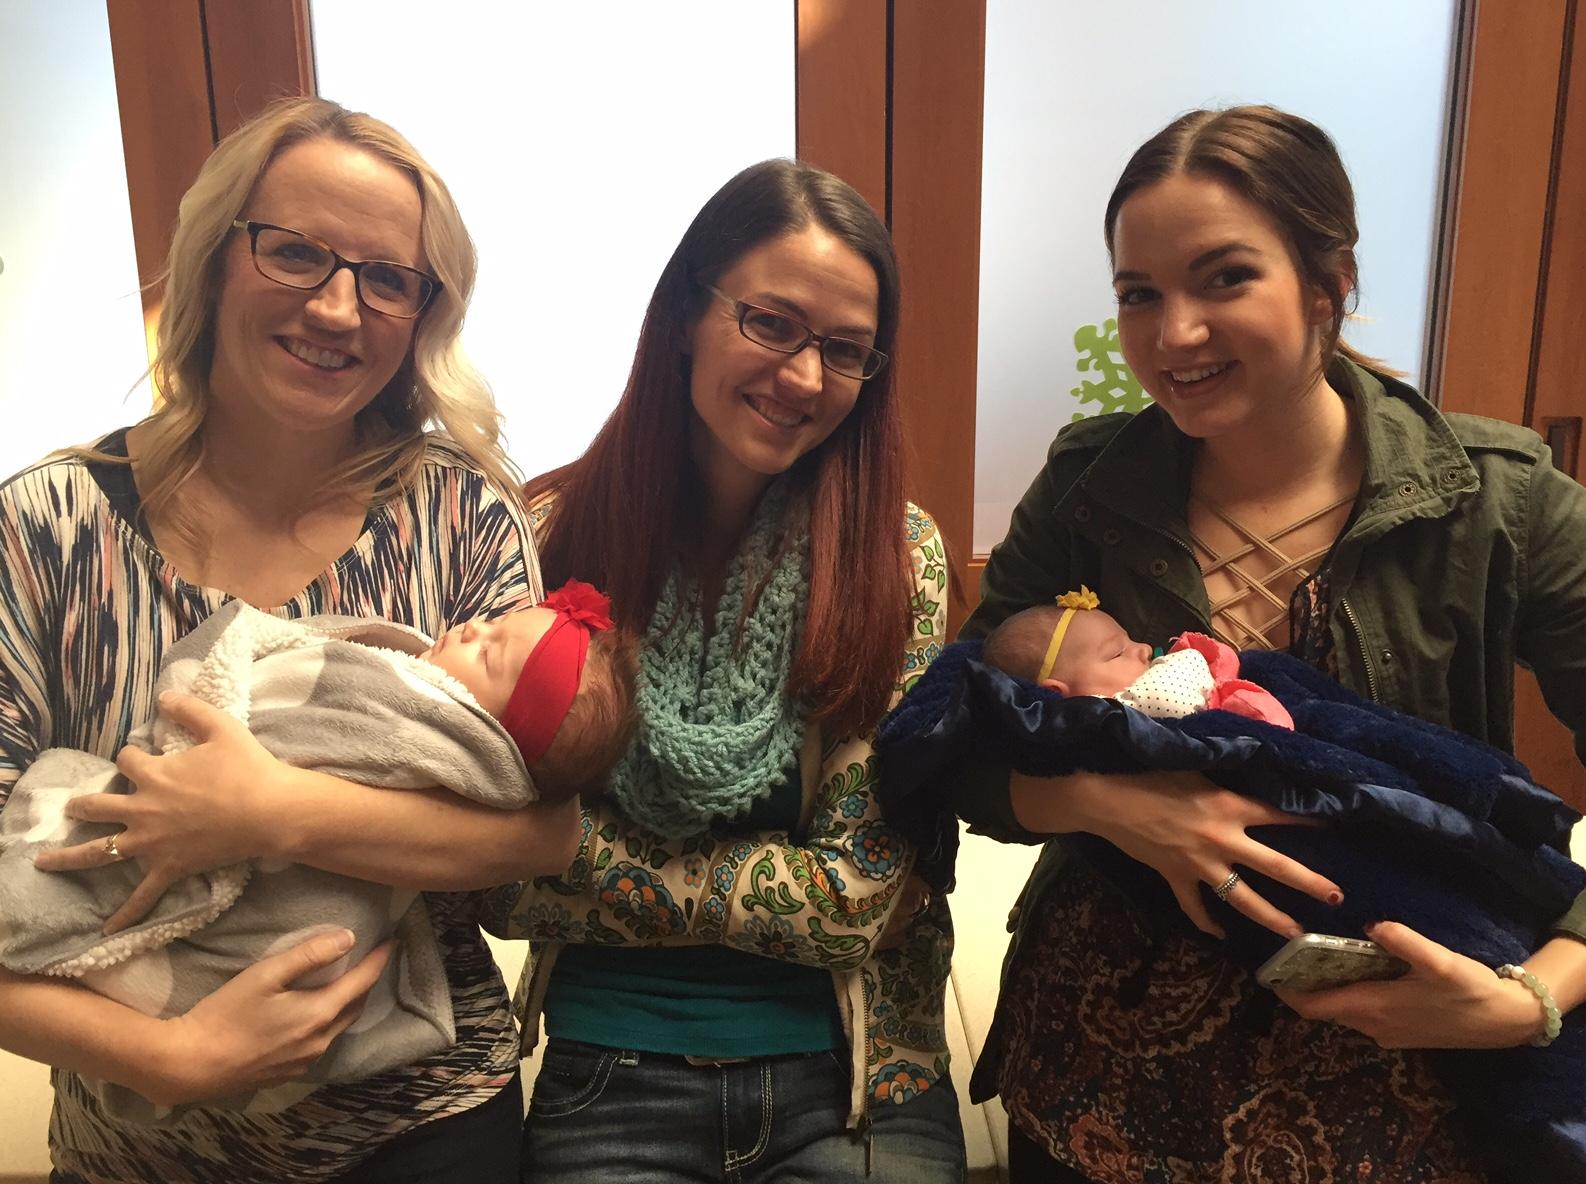 girls with babies.jpeg